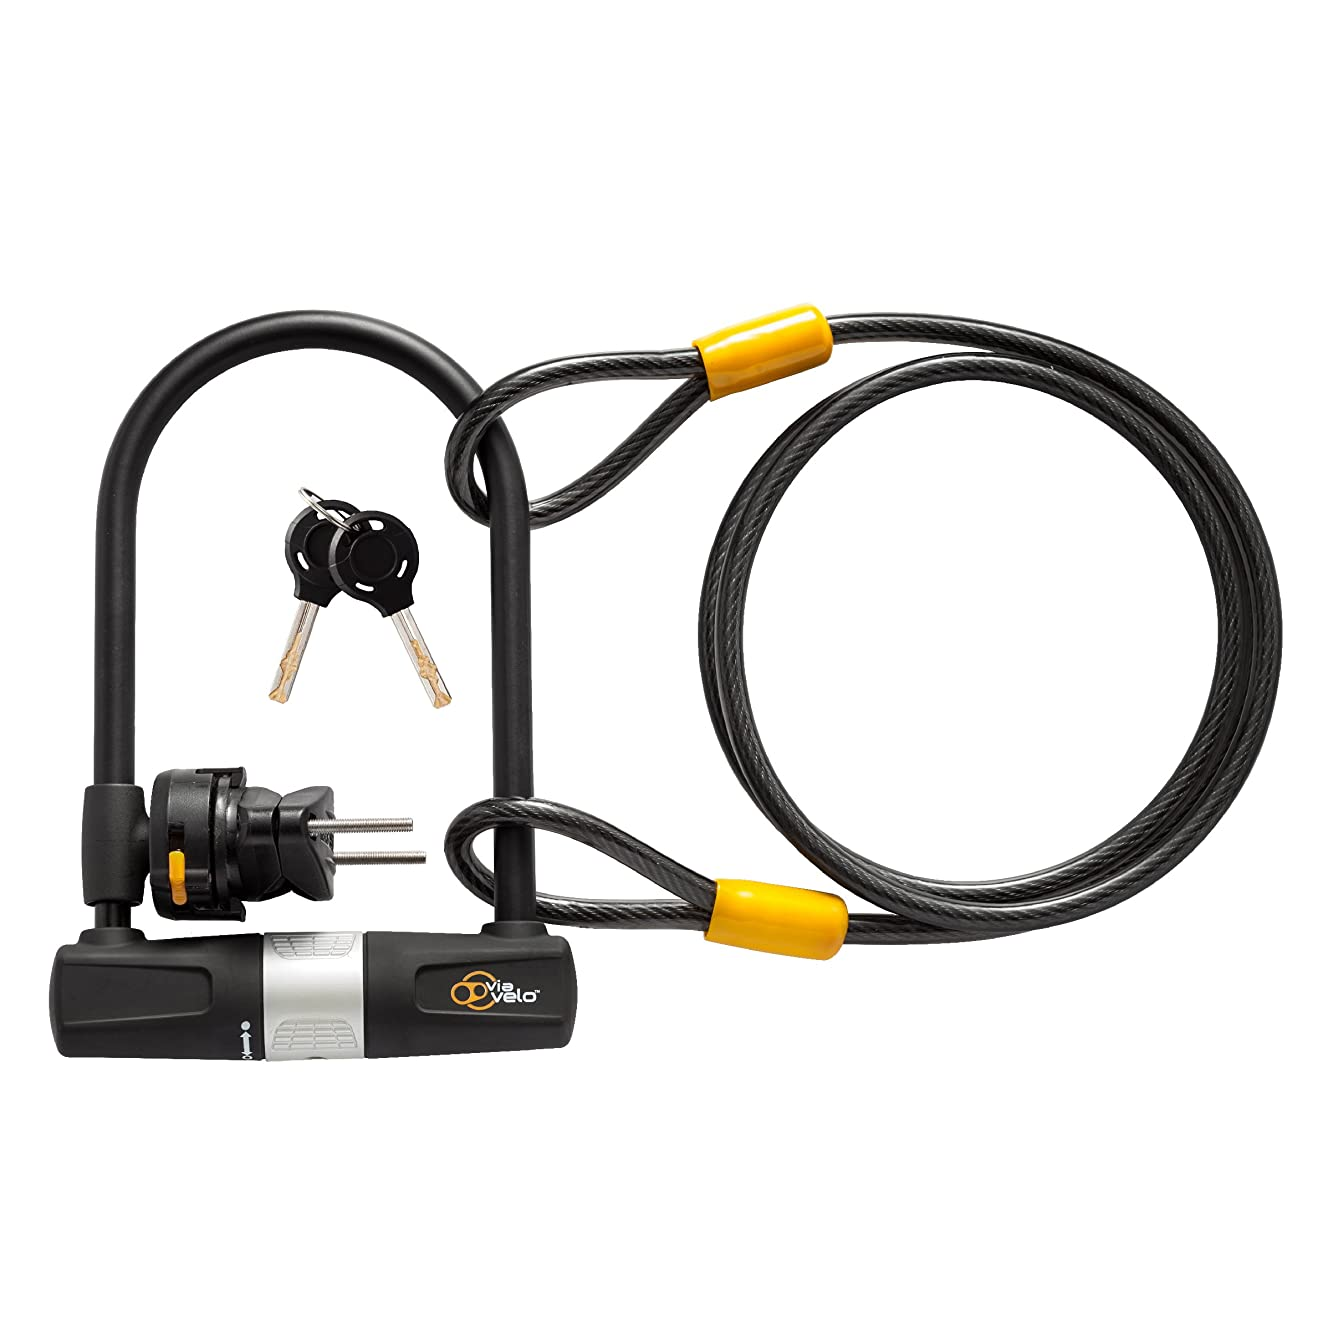 Bike U Lock with Cable - Via Velo Heavy Duty Bicycle U-Lock,14mm Shackle and 10mm x1.8m Cable with Mounting Bracket For Road Bike Mountain Bike Electric Bike Folding Bike, Great Bike Safety Tool